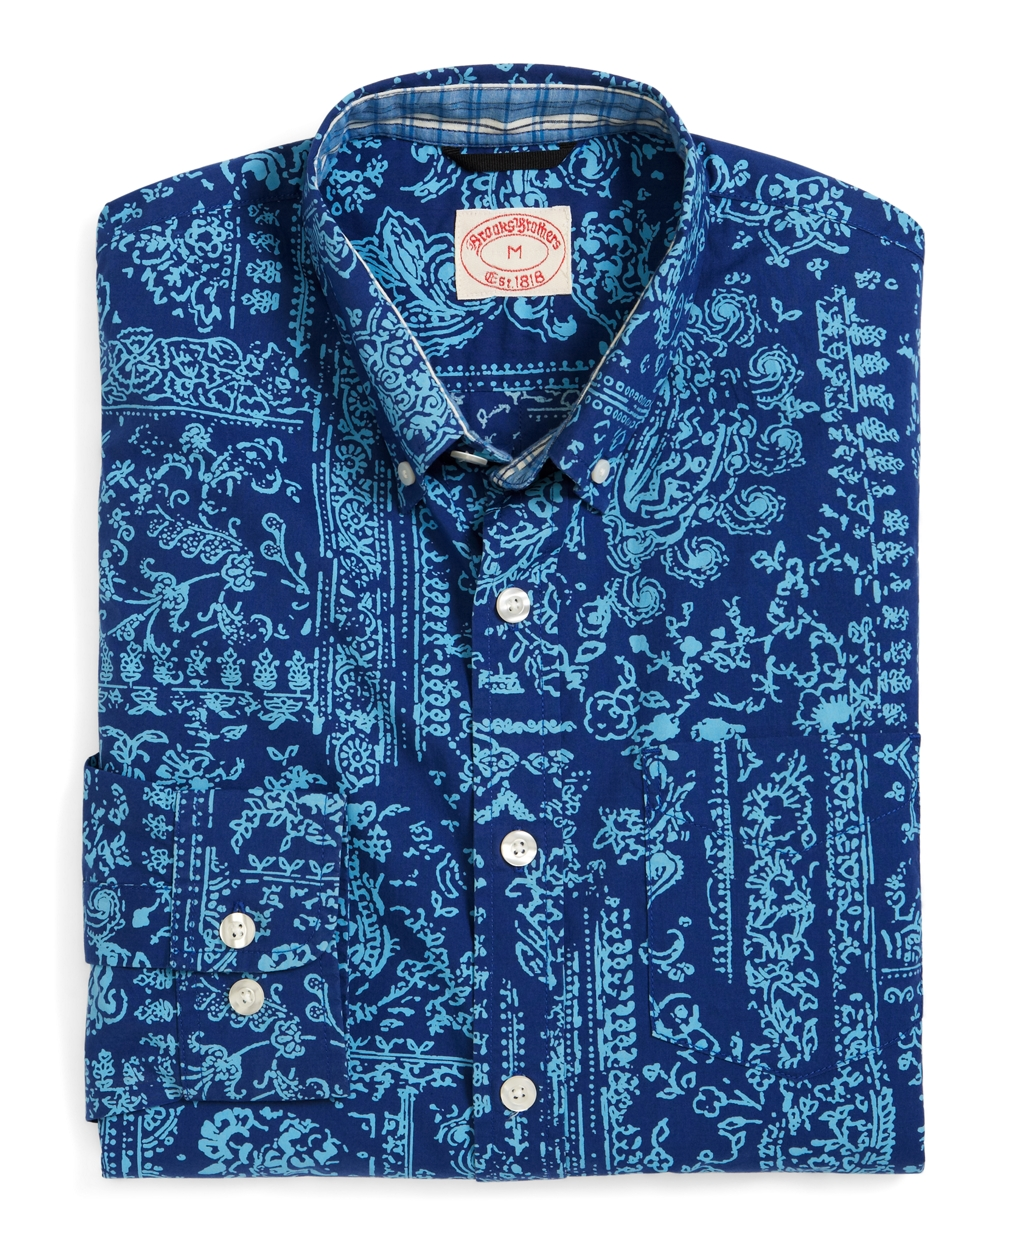 Brooks brothers hibiscus print short sleeve sport shirt in for Men s batik bay silk blend button down shirt